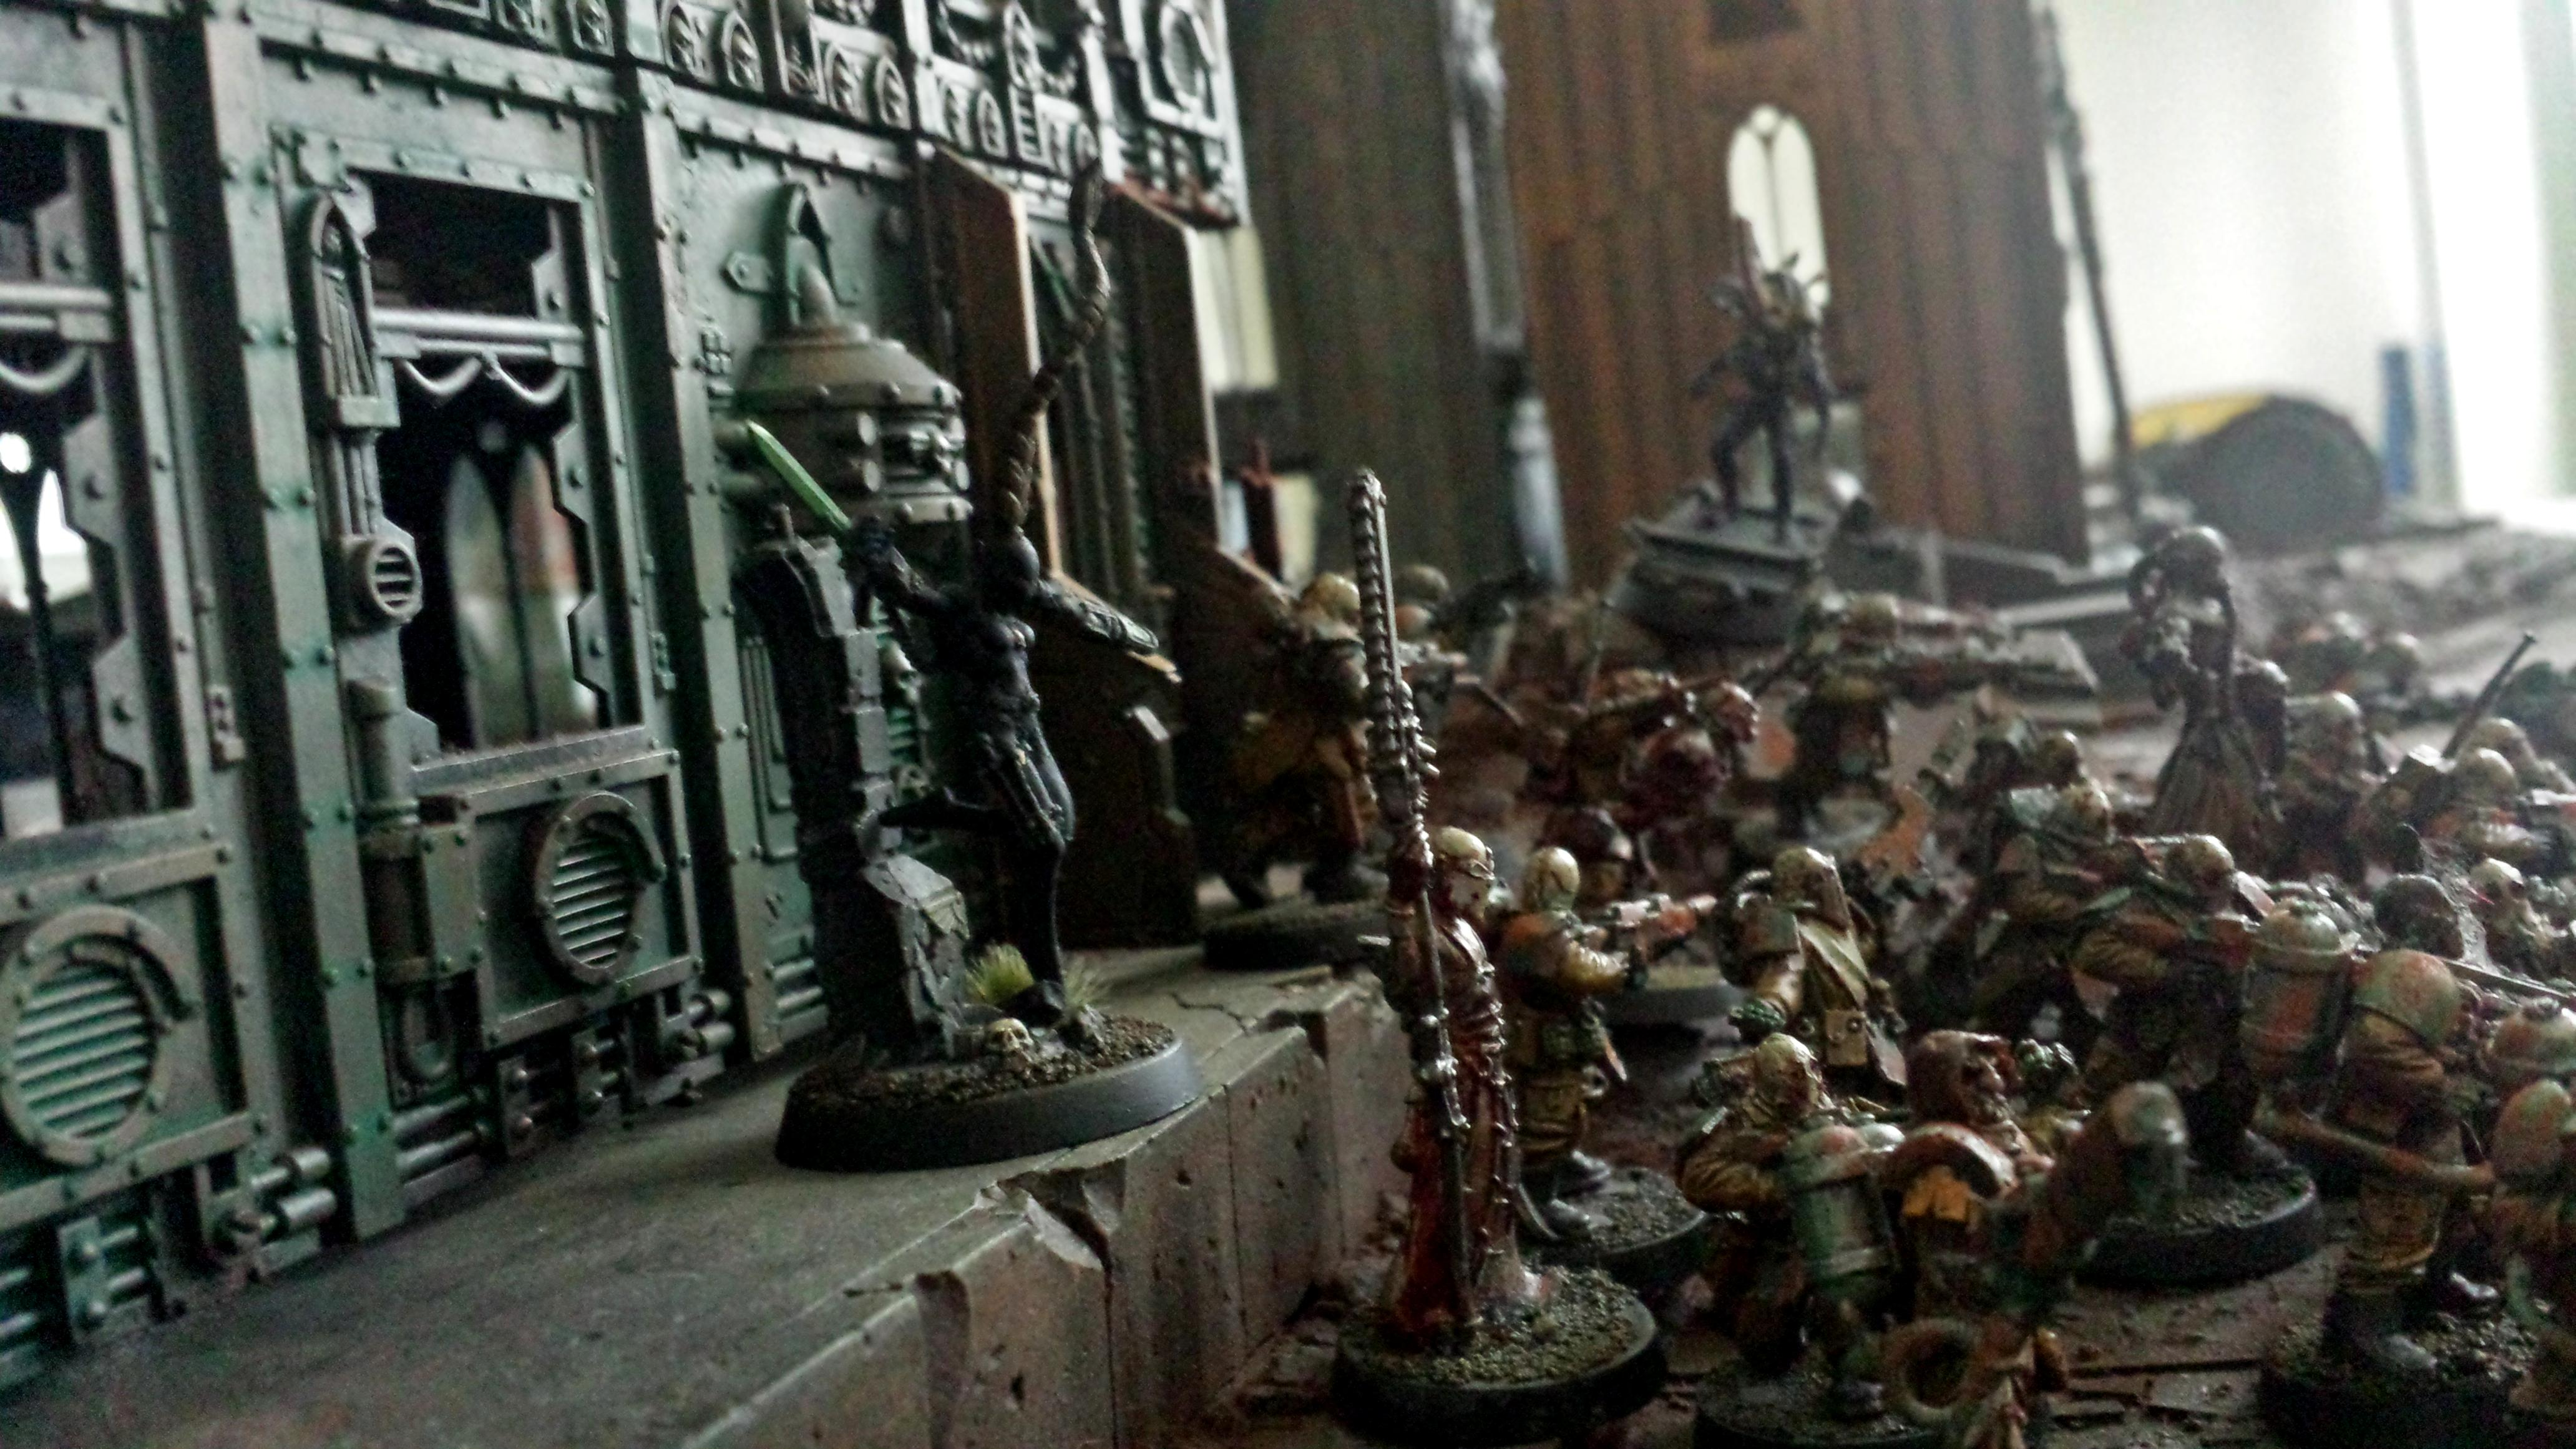 Apostles Of Contagion, Assassins, Chaos, Forge World, Nurgle, Renegades, Terrain, Warhammer 40,000